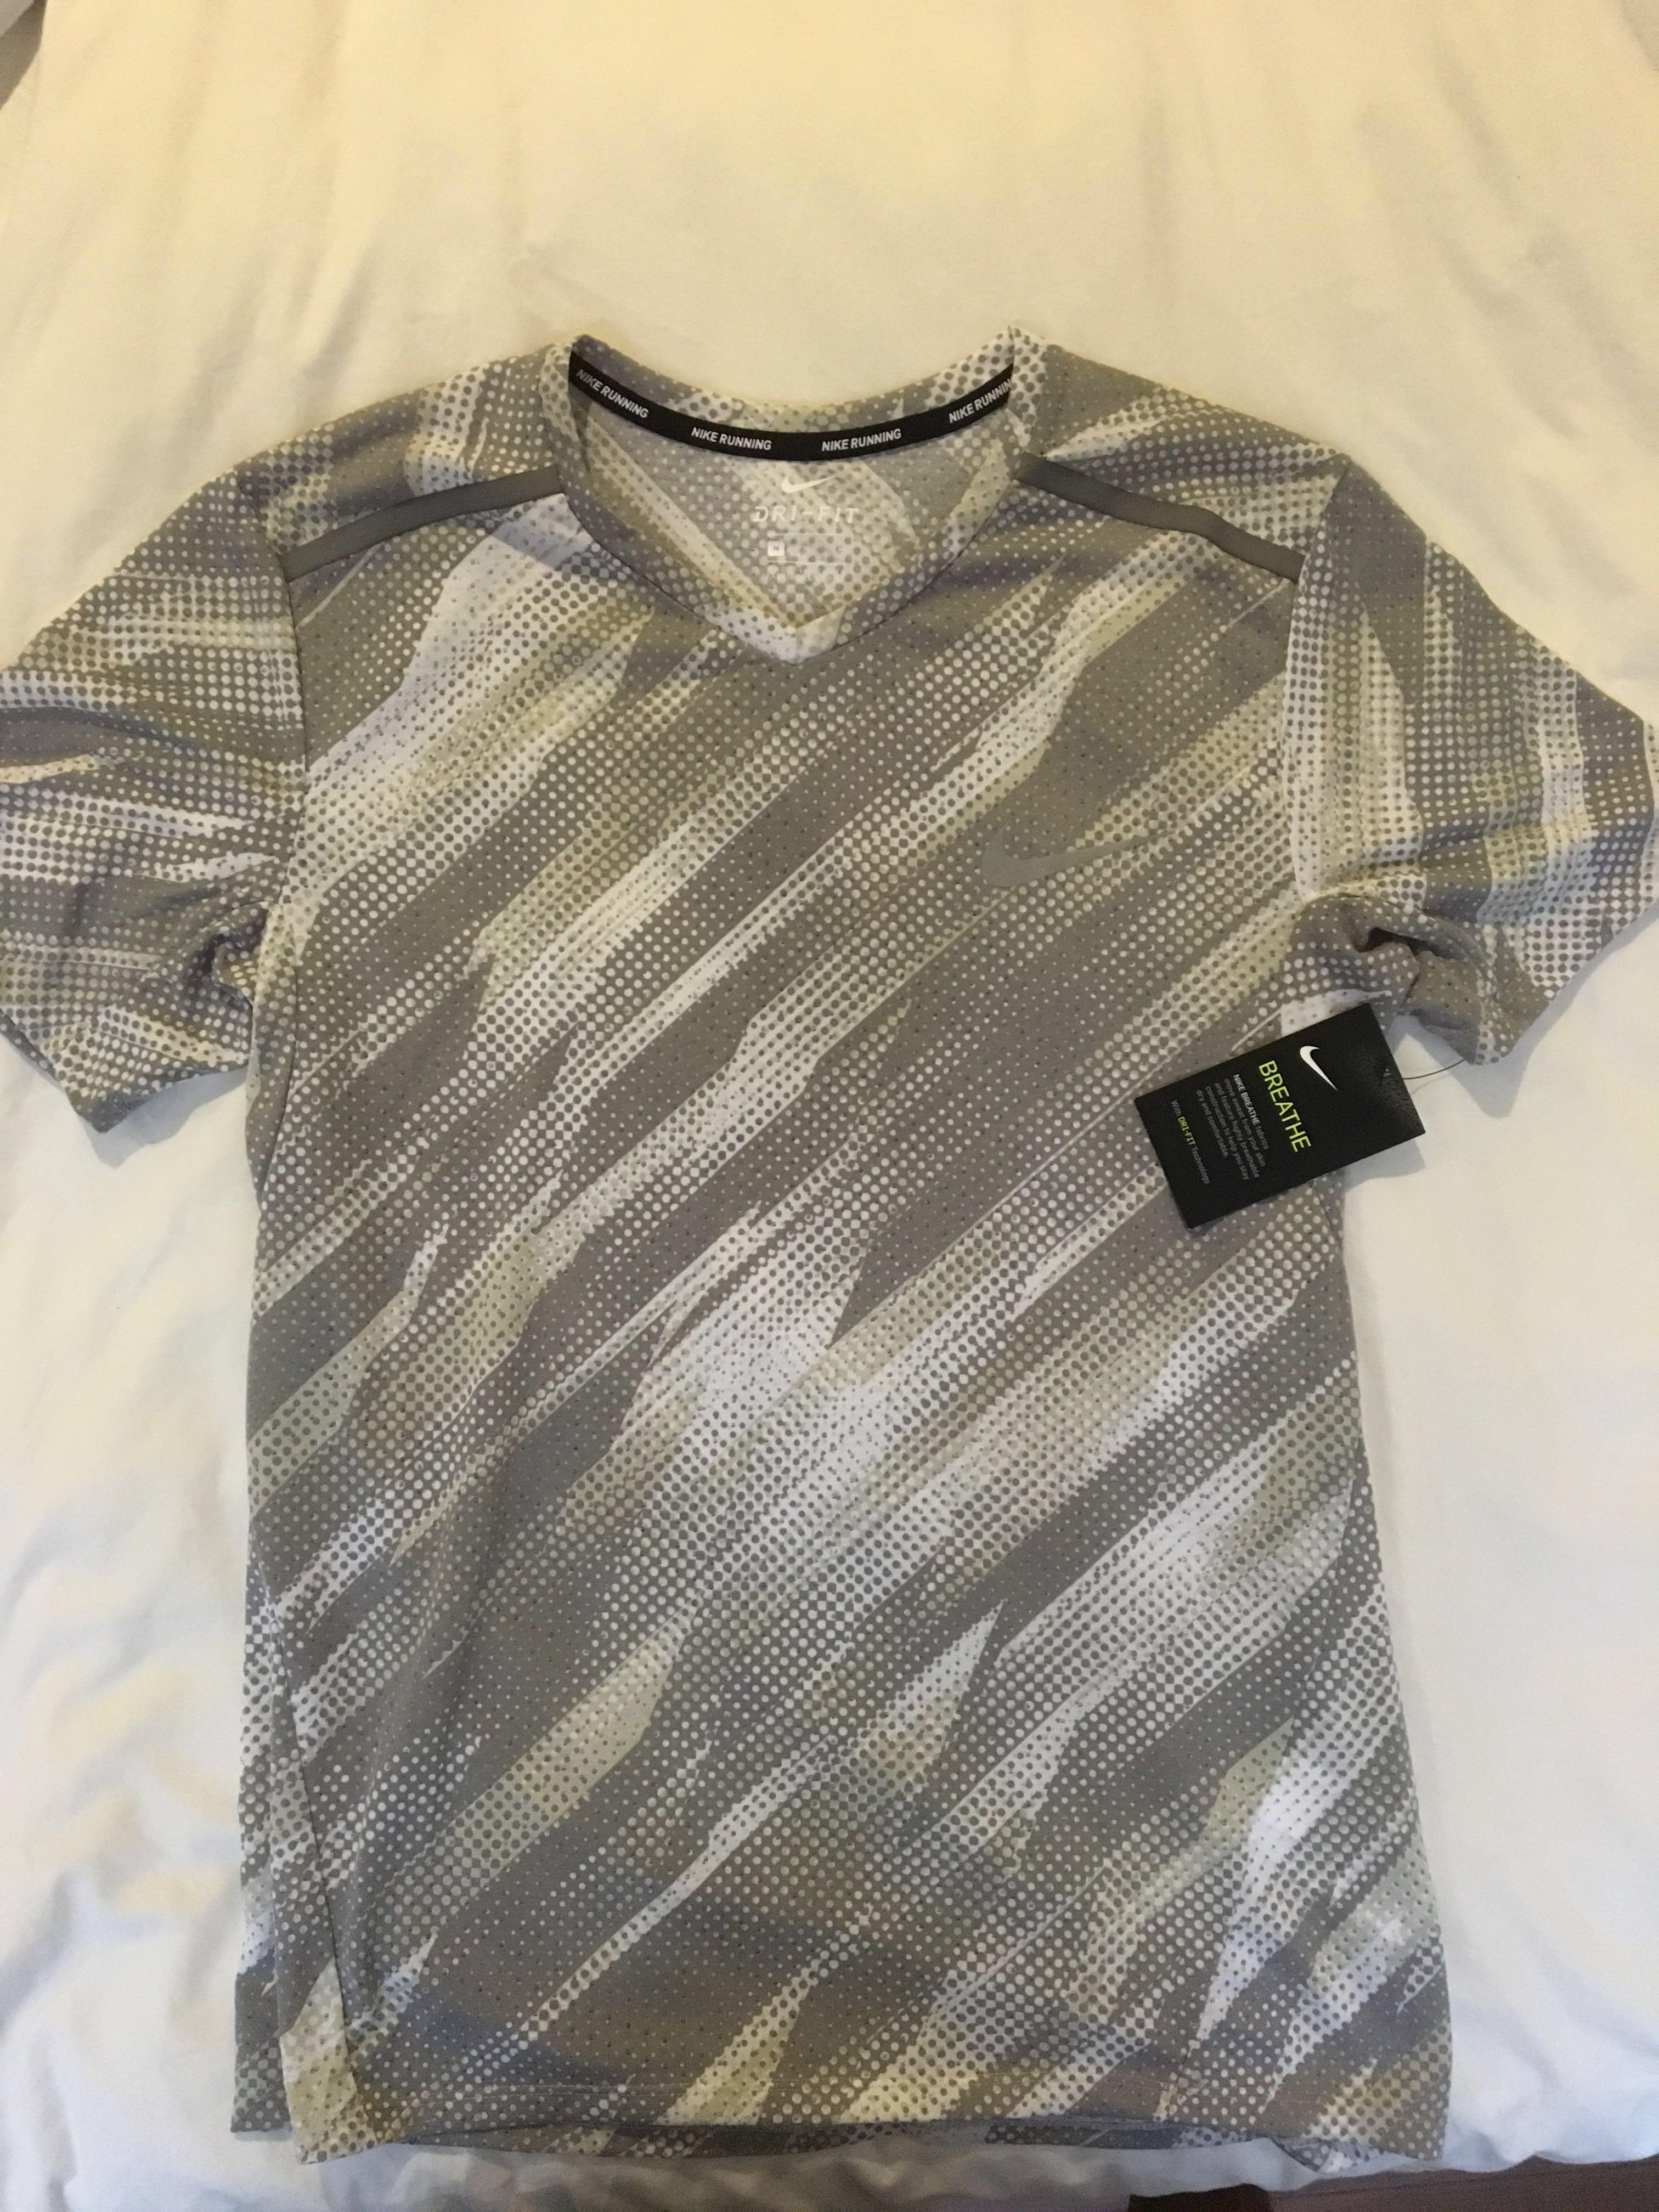 c16ba4f8 Nike Breathe DriFit Running Shirt, Sports, Sports Apparel on Carousell